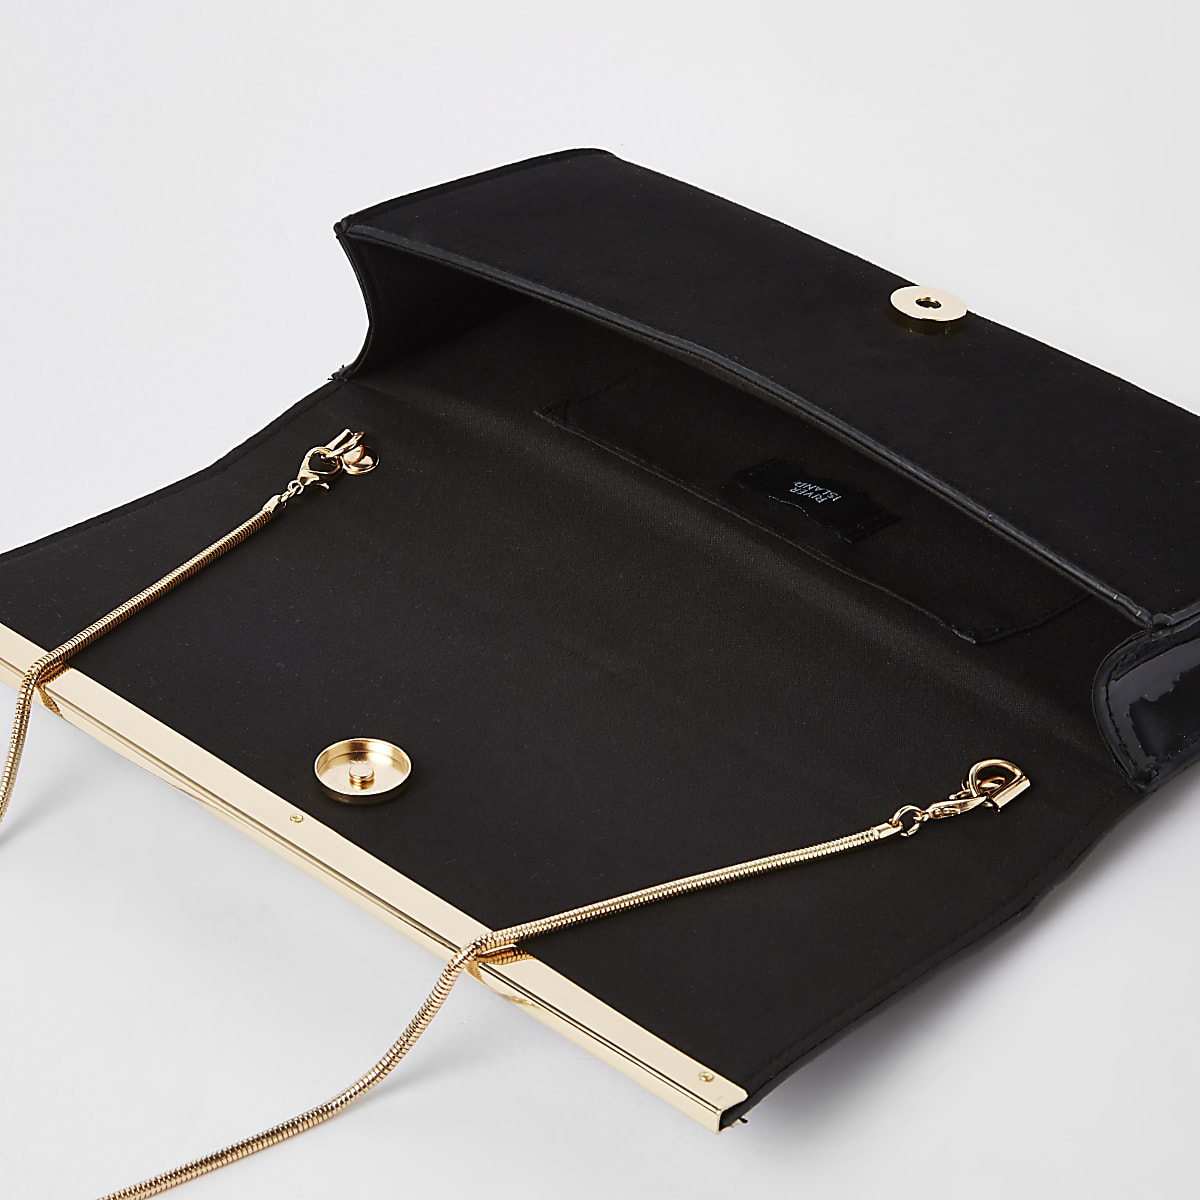 78e0ccacc Black faux suede croc embossed clutch bag - Clutch Bags - Bags ...